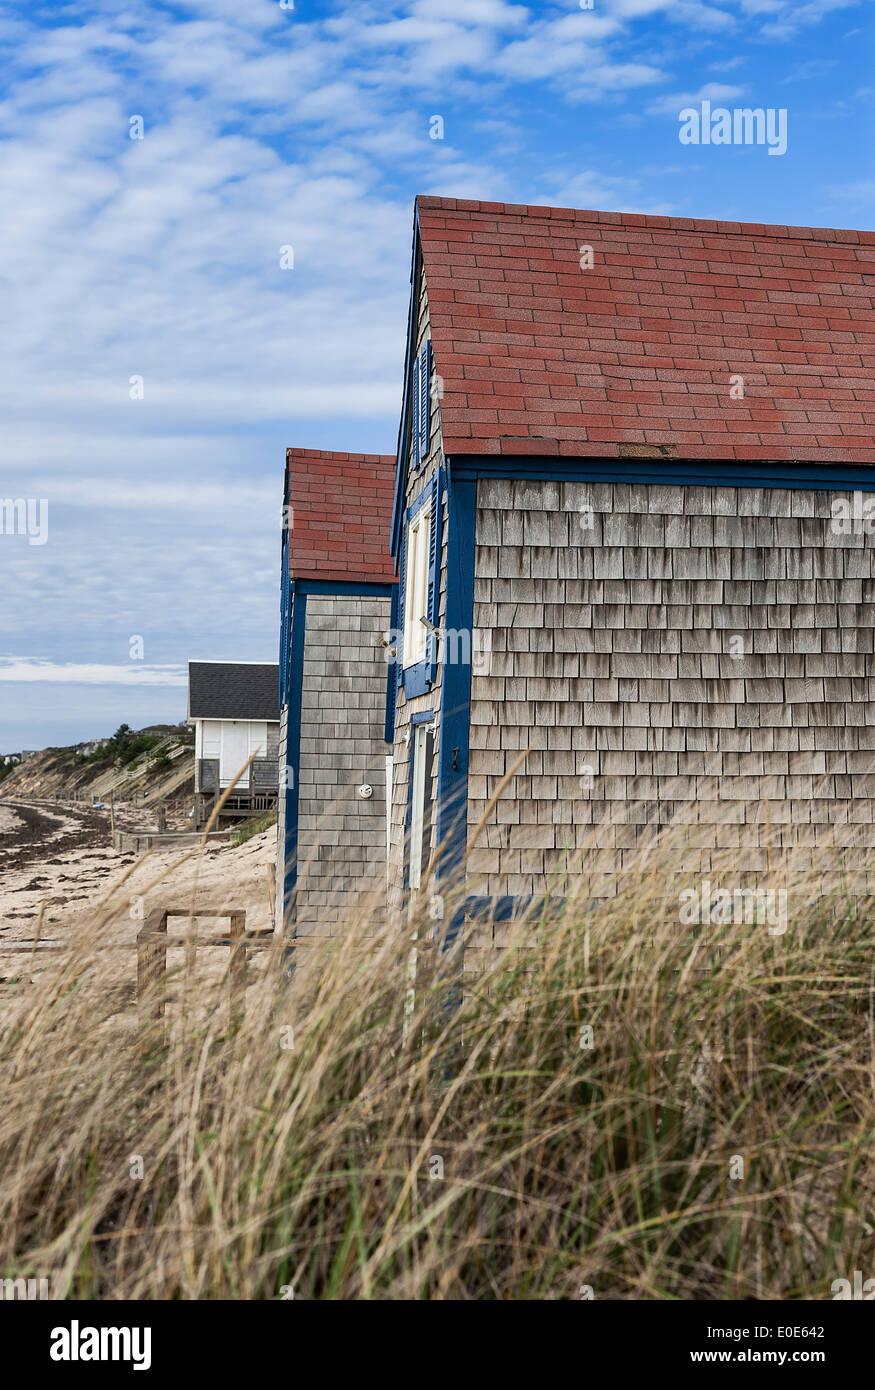 Shed Weathered Beach Stockfotos & Shed Weathered Beach Bilder - Alamy